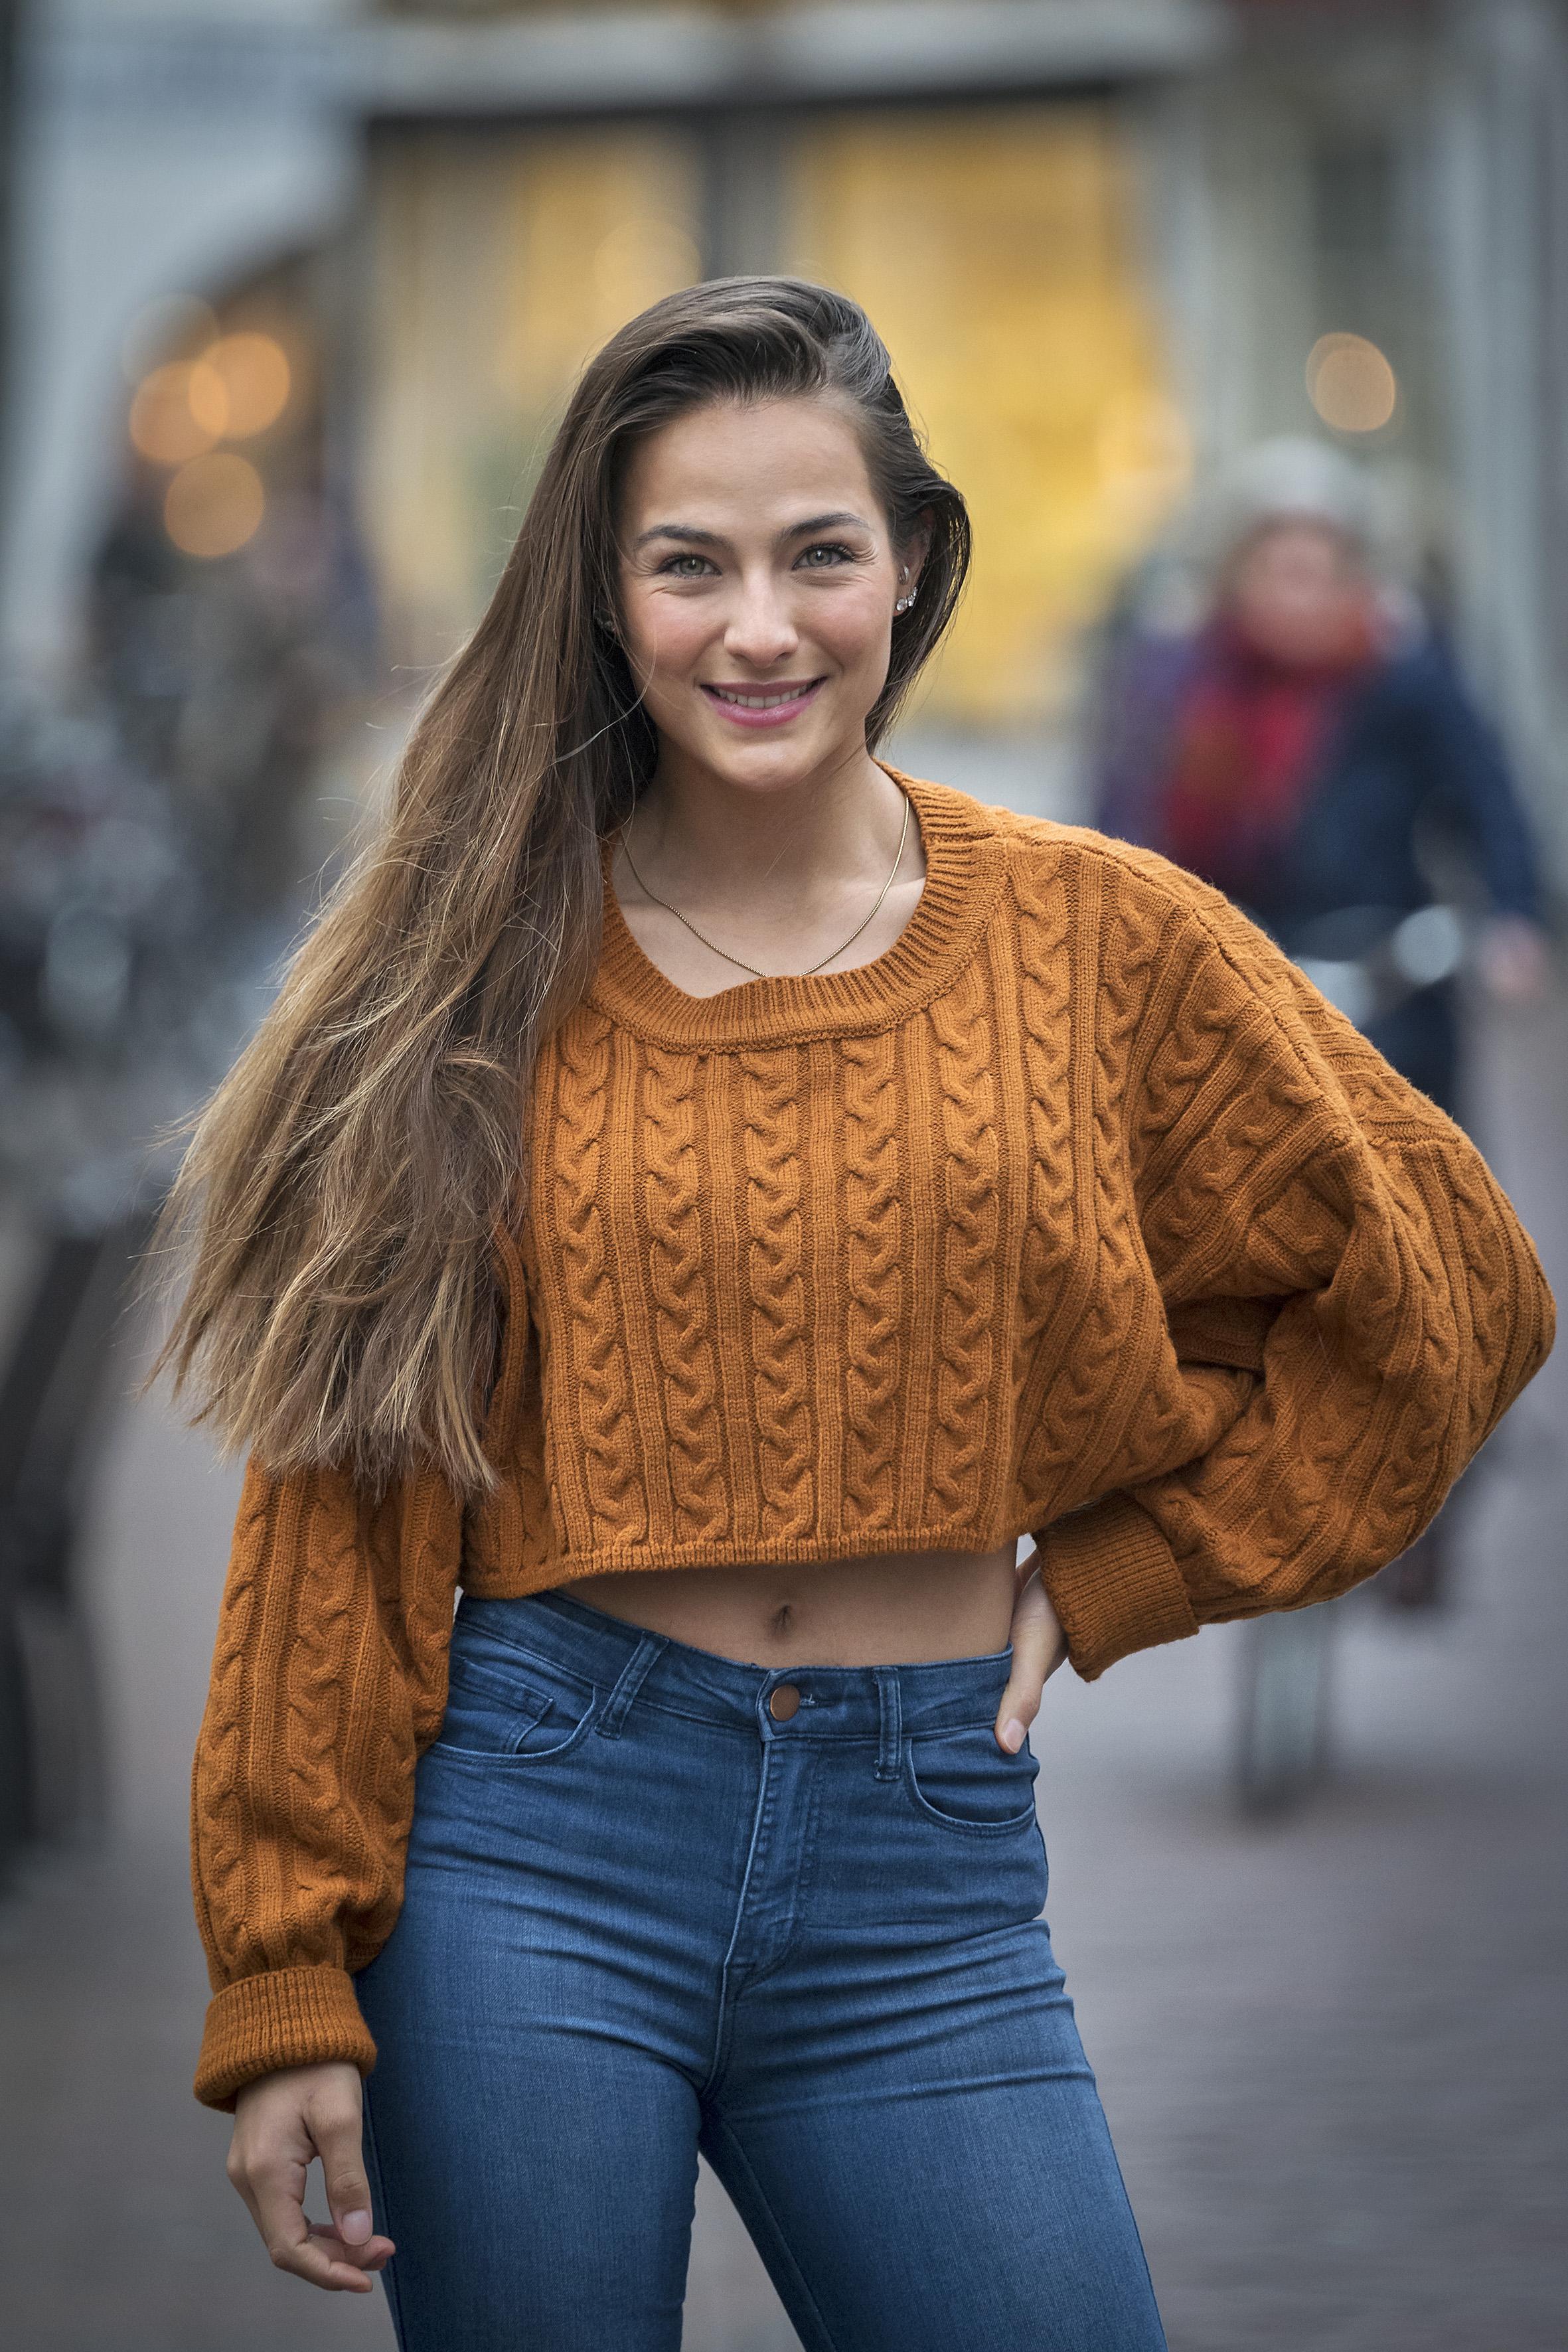 Haarlemse politieagente verdient haar geld nu met Instagram